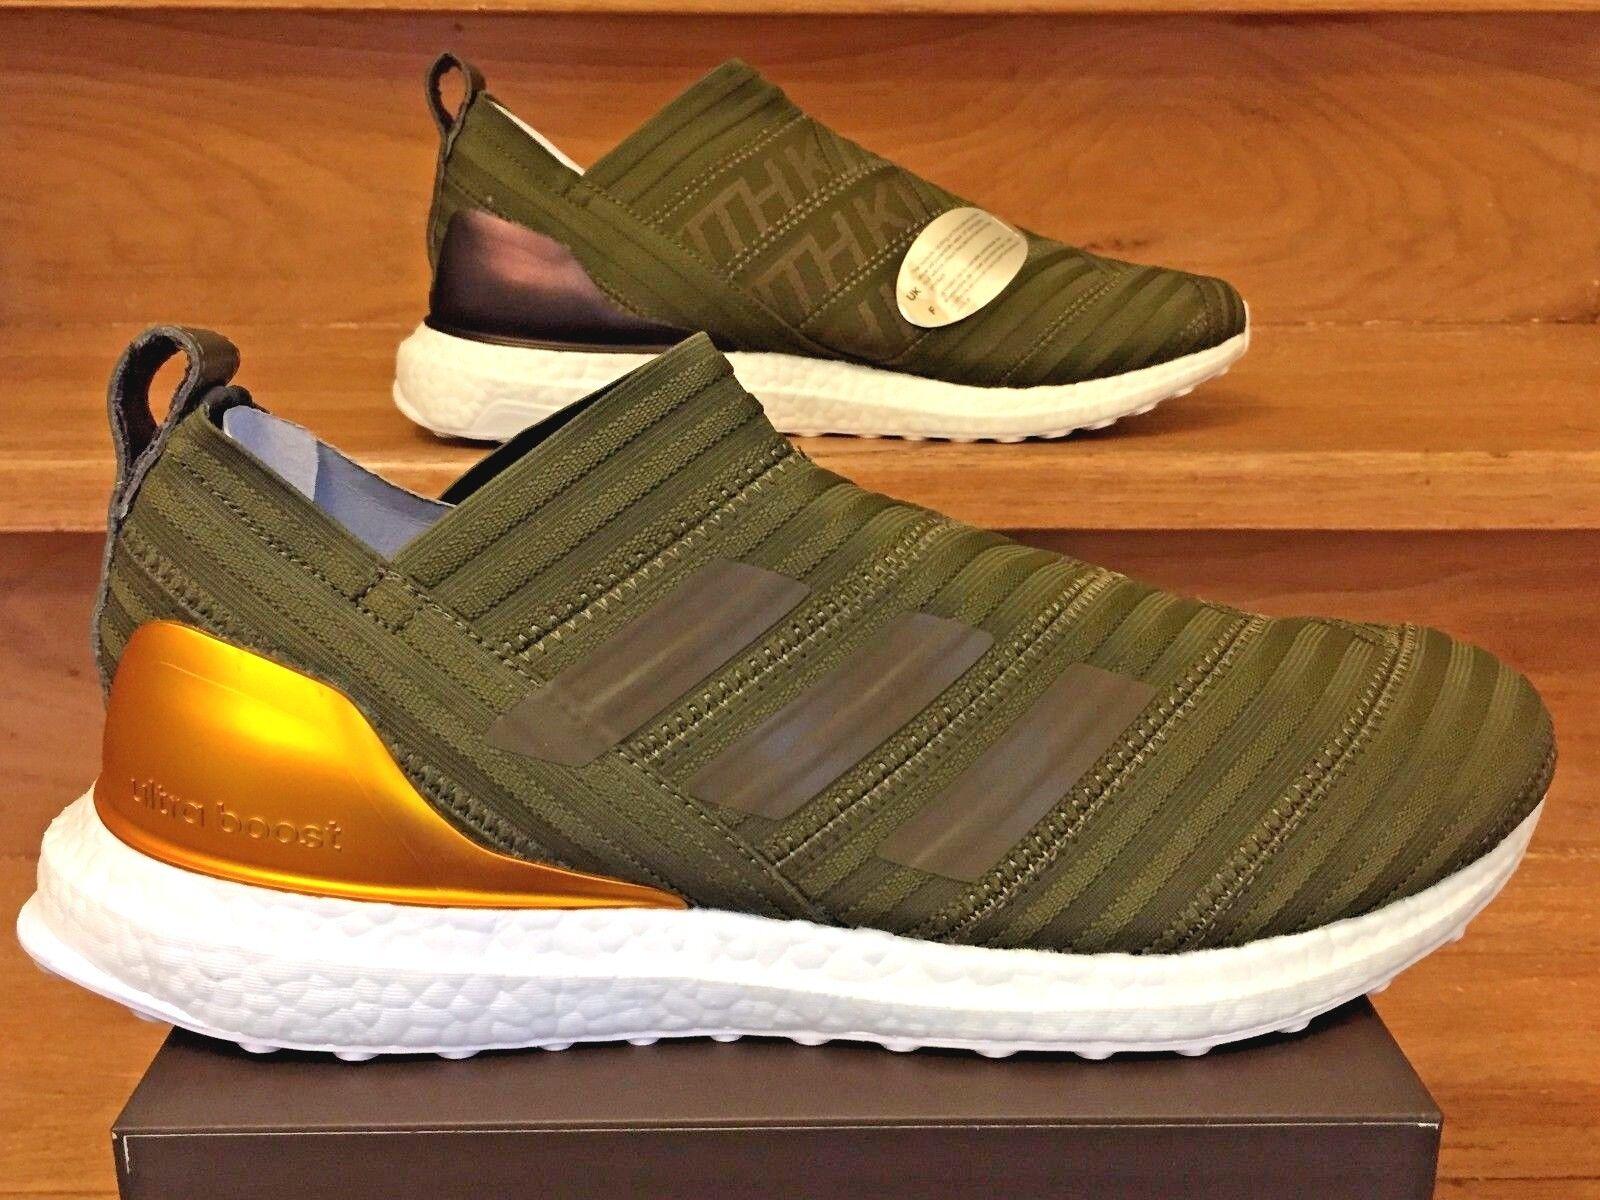 KITH x Adidas Nemeziz Ultra Boost 17+